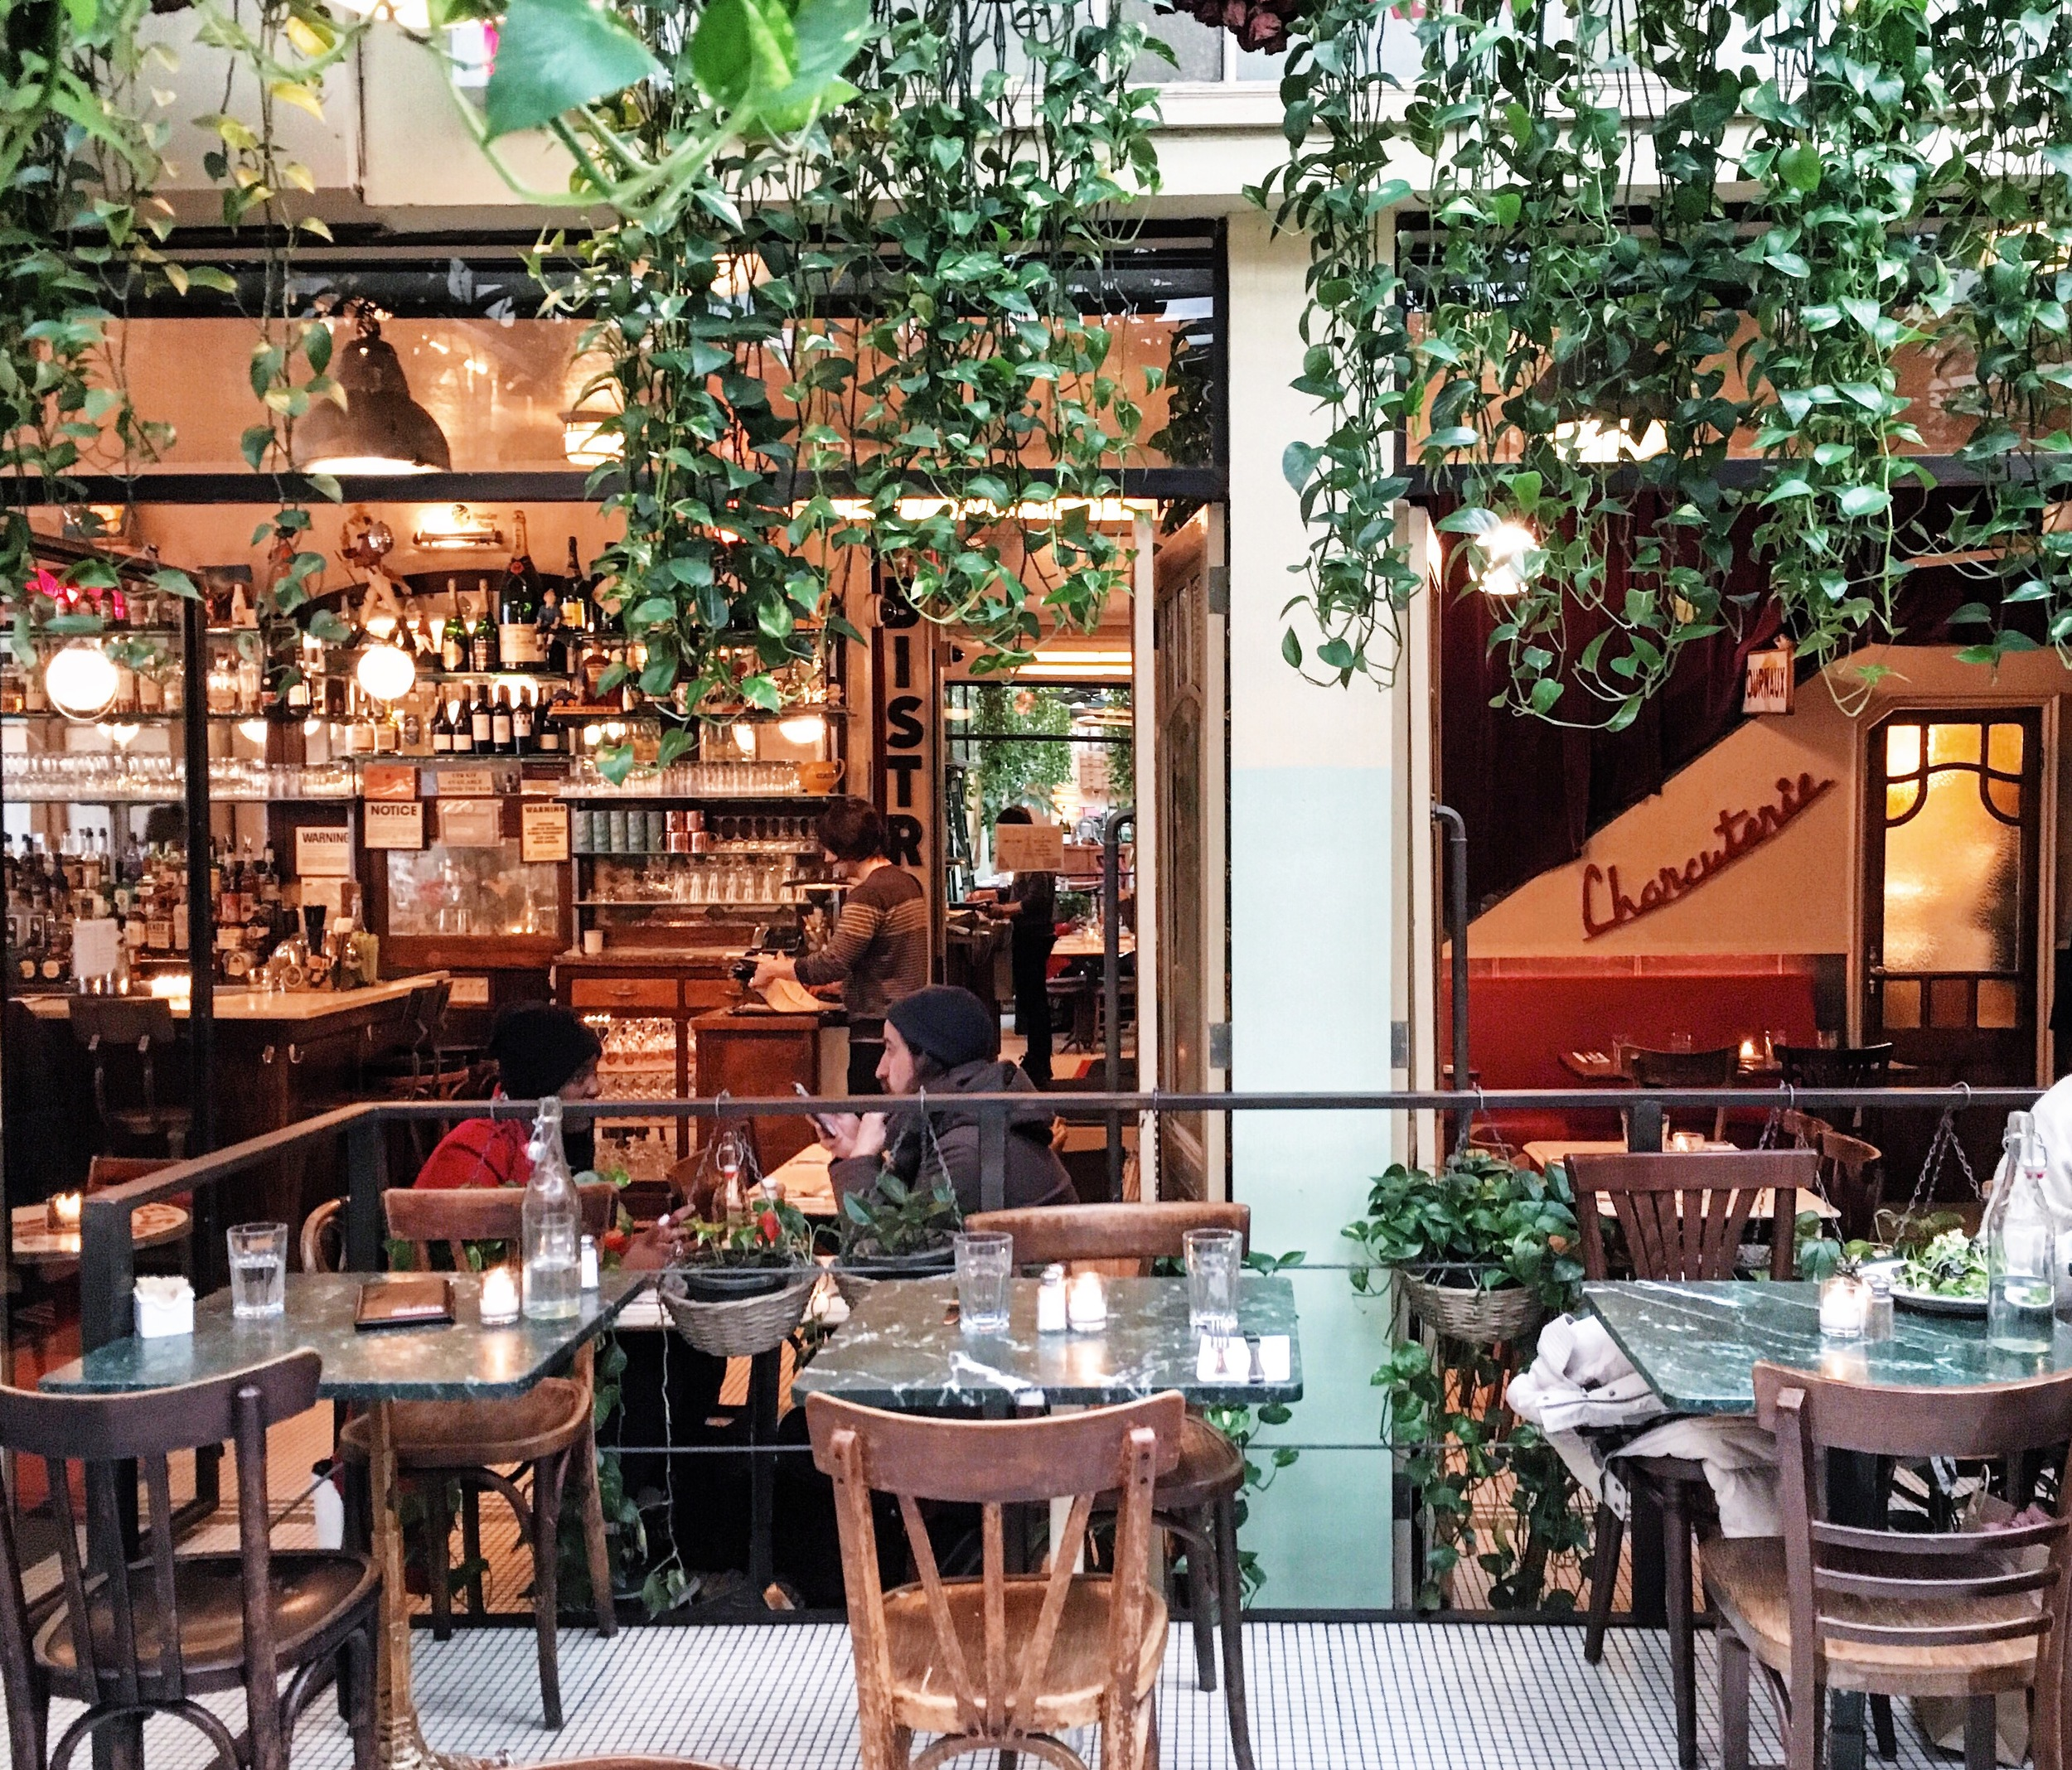 Juliette Restaurant, Brooklyn, 135 N 5th St